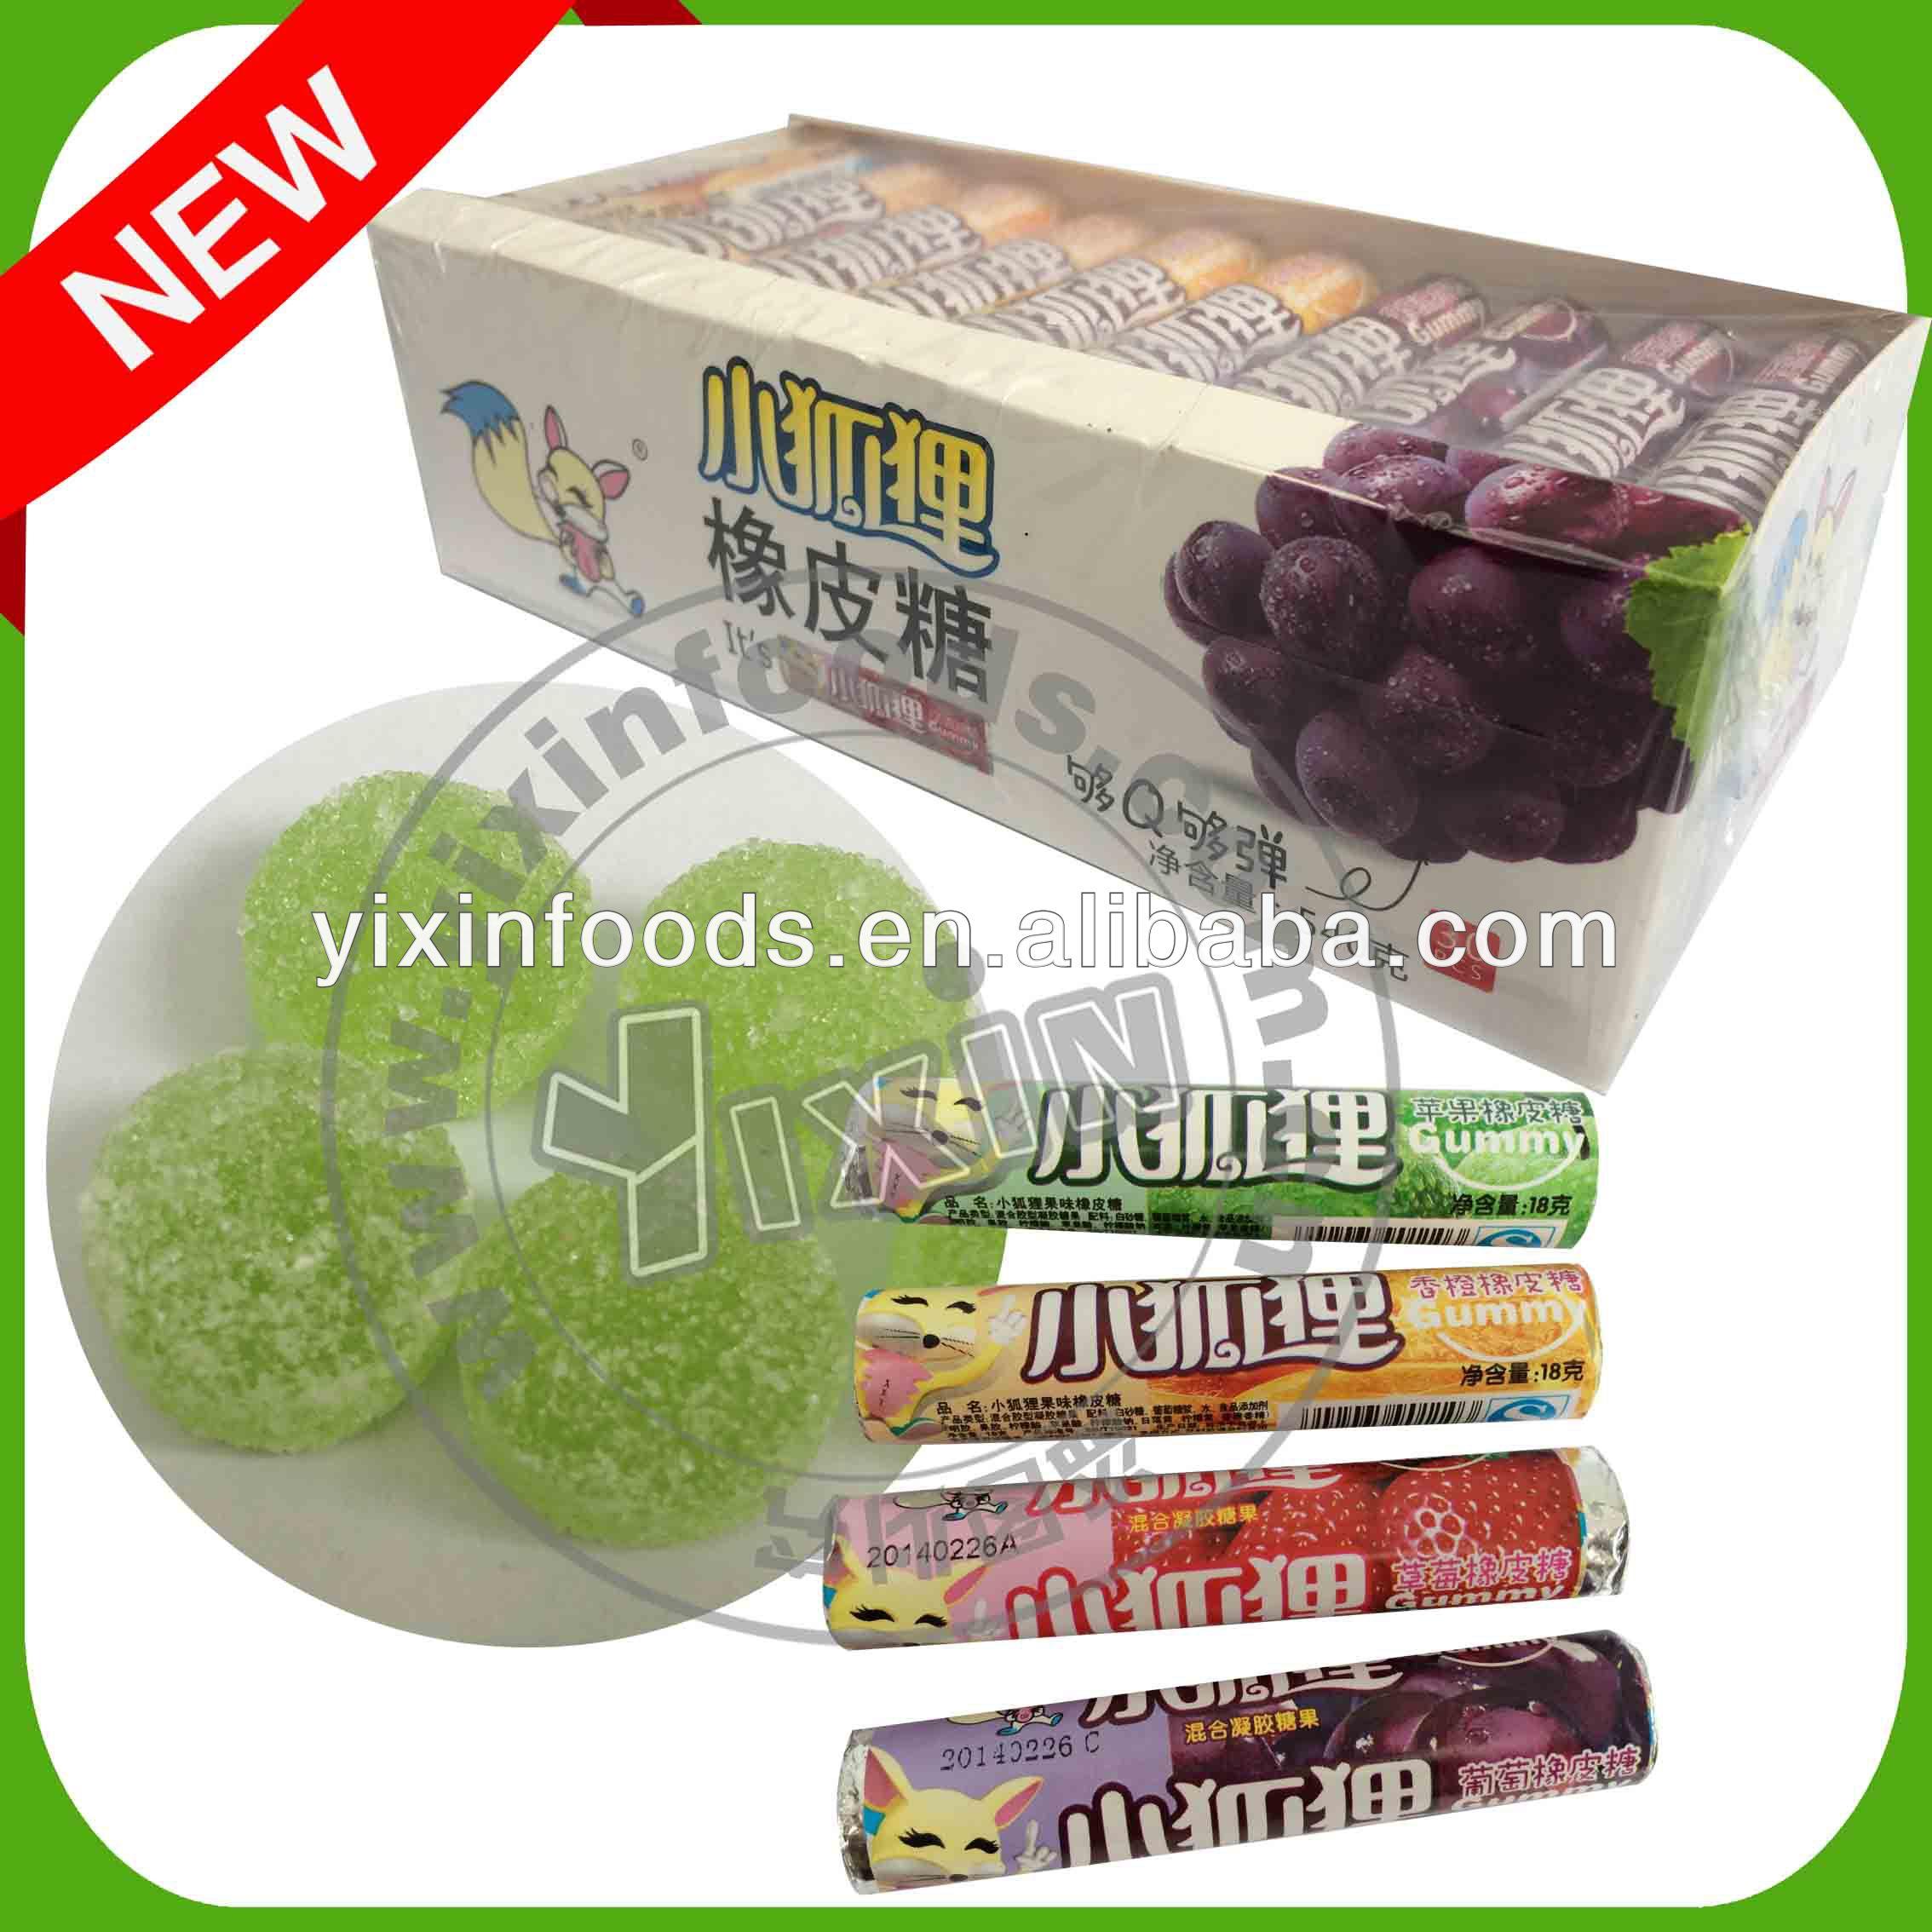 Fruta de goma del caramelo en caja